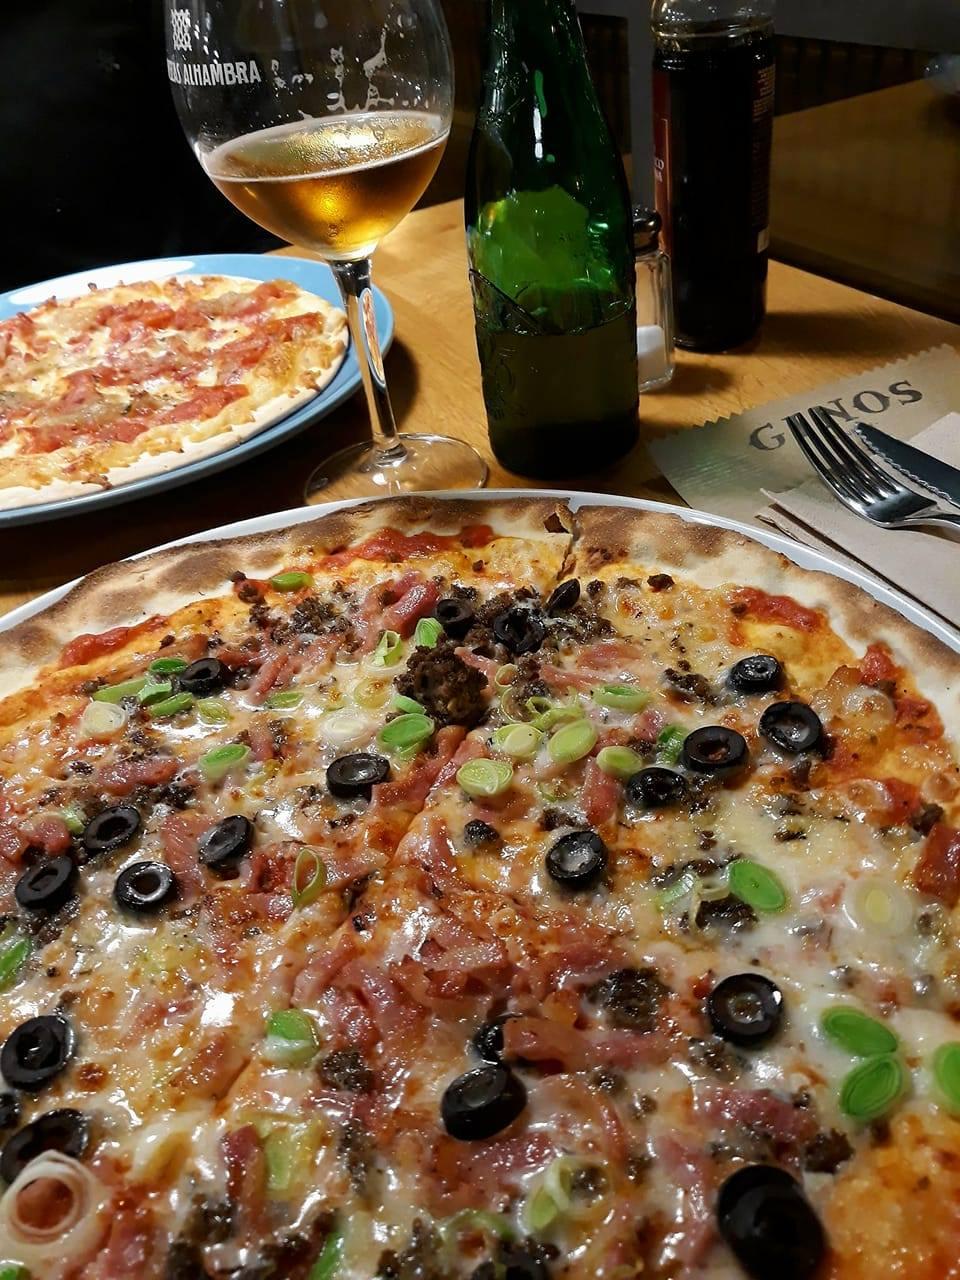 Valencia senza glutine - Gluten Free Travel and Living